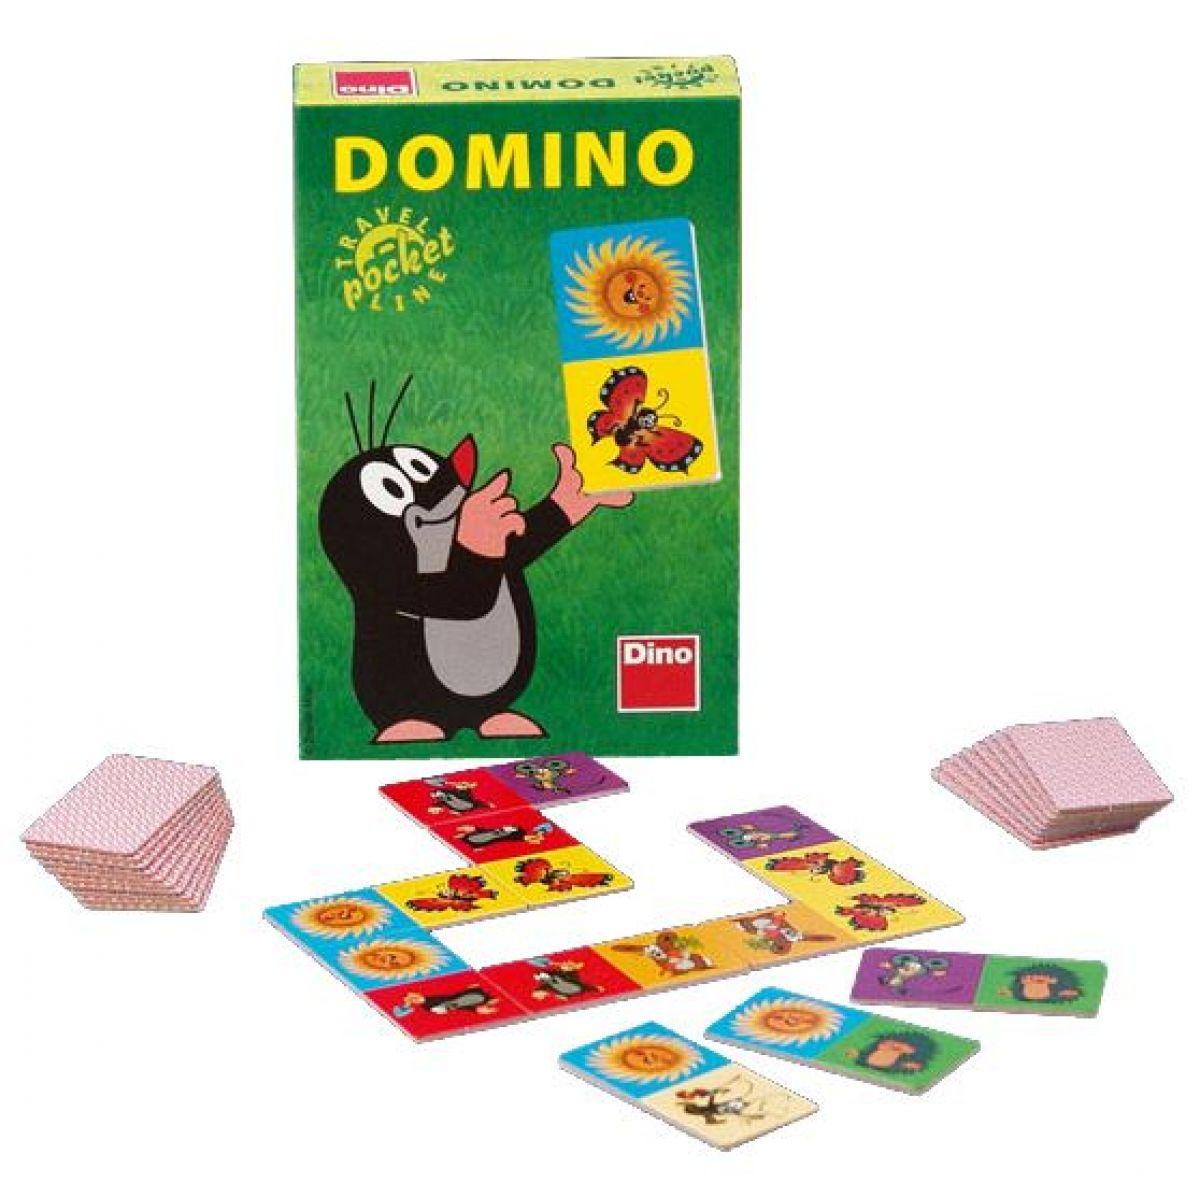 Dino Domino Krtek společenská hra na cesty 28ks